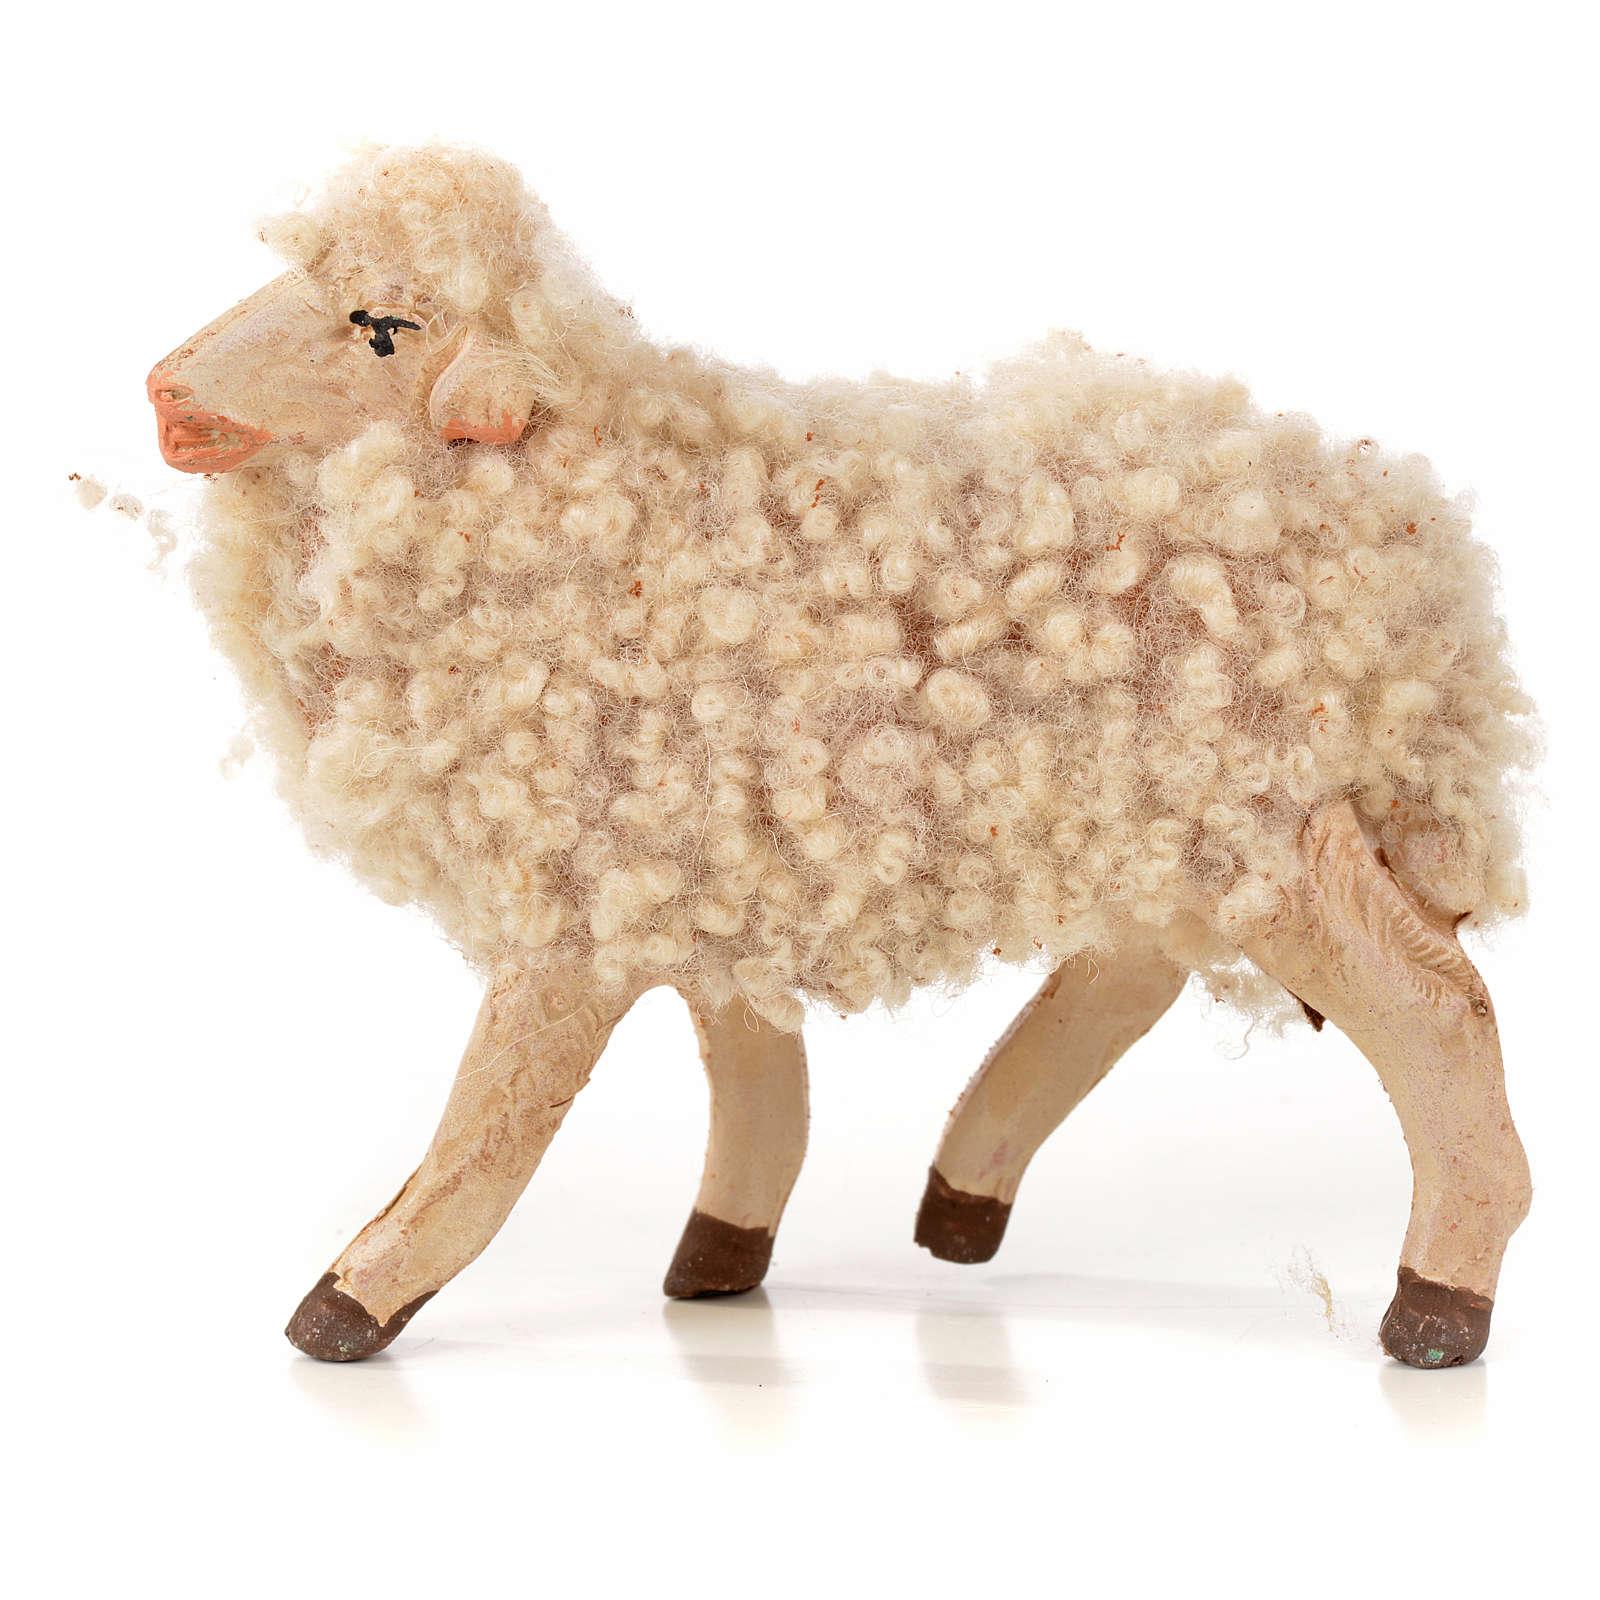 Neapolitan Nativity scene figurine, kit, 3 sheep with wool 14 cm 4